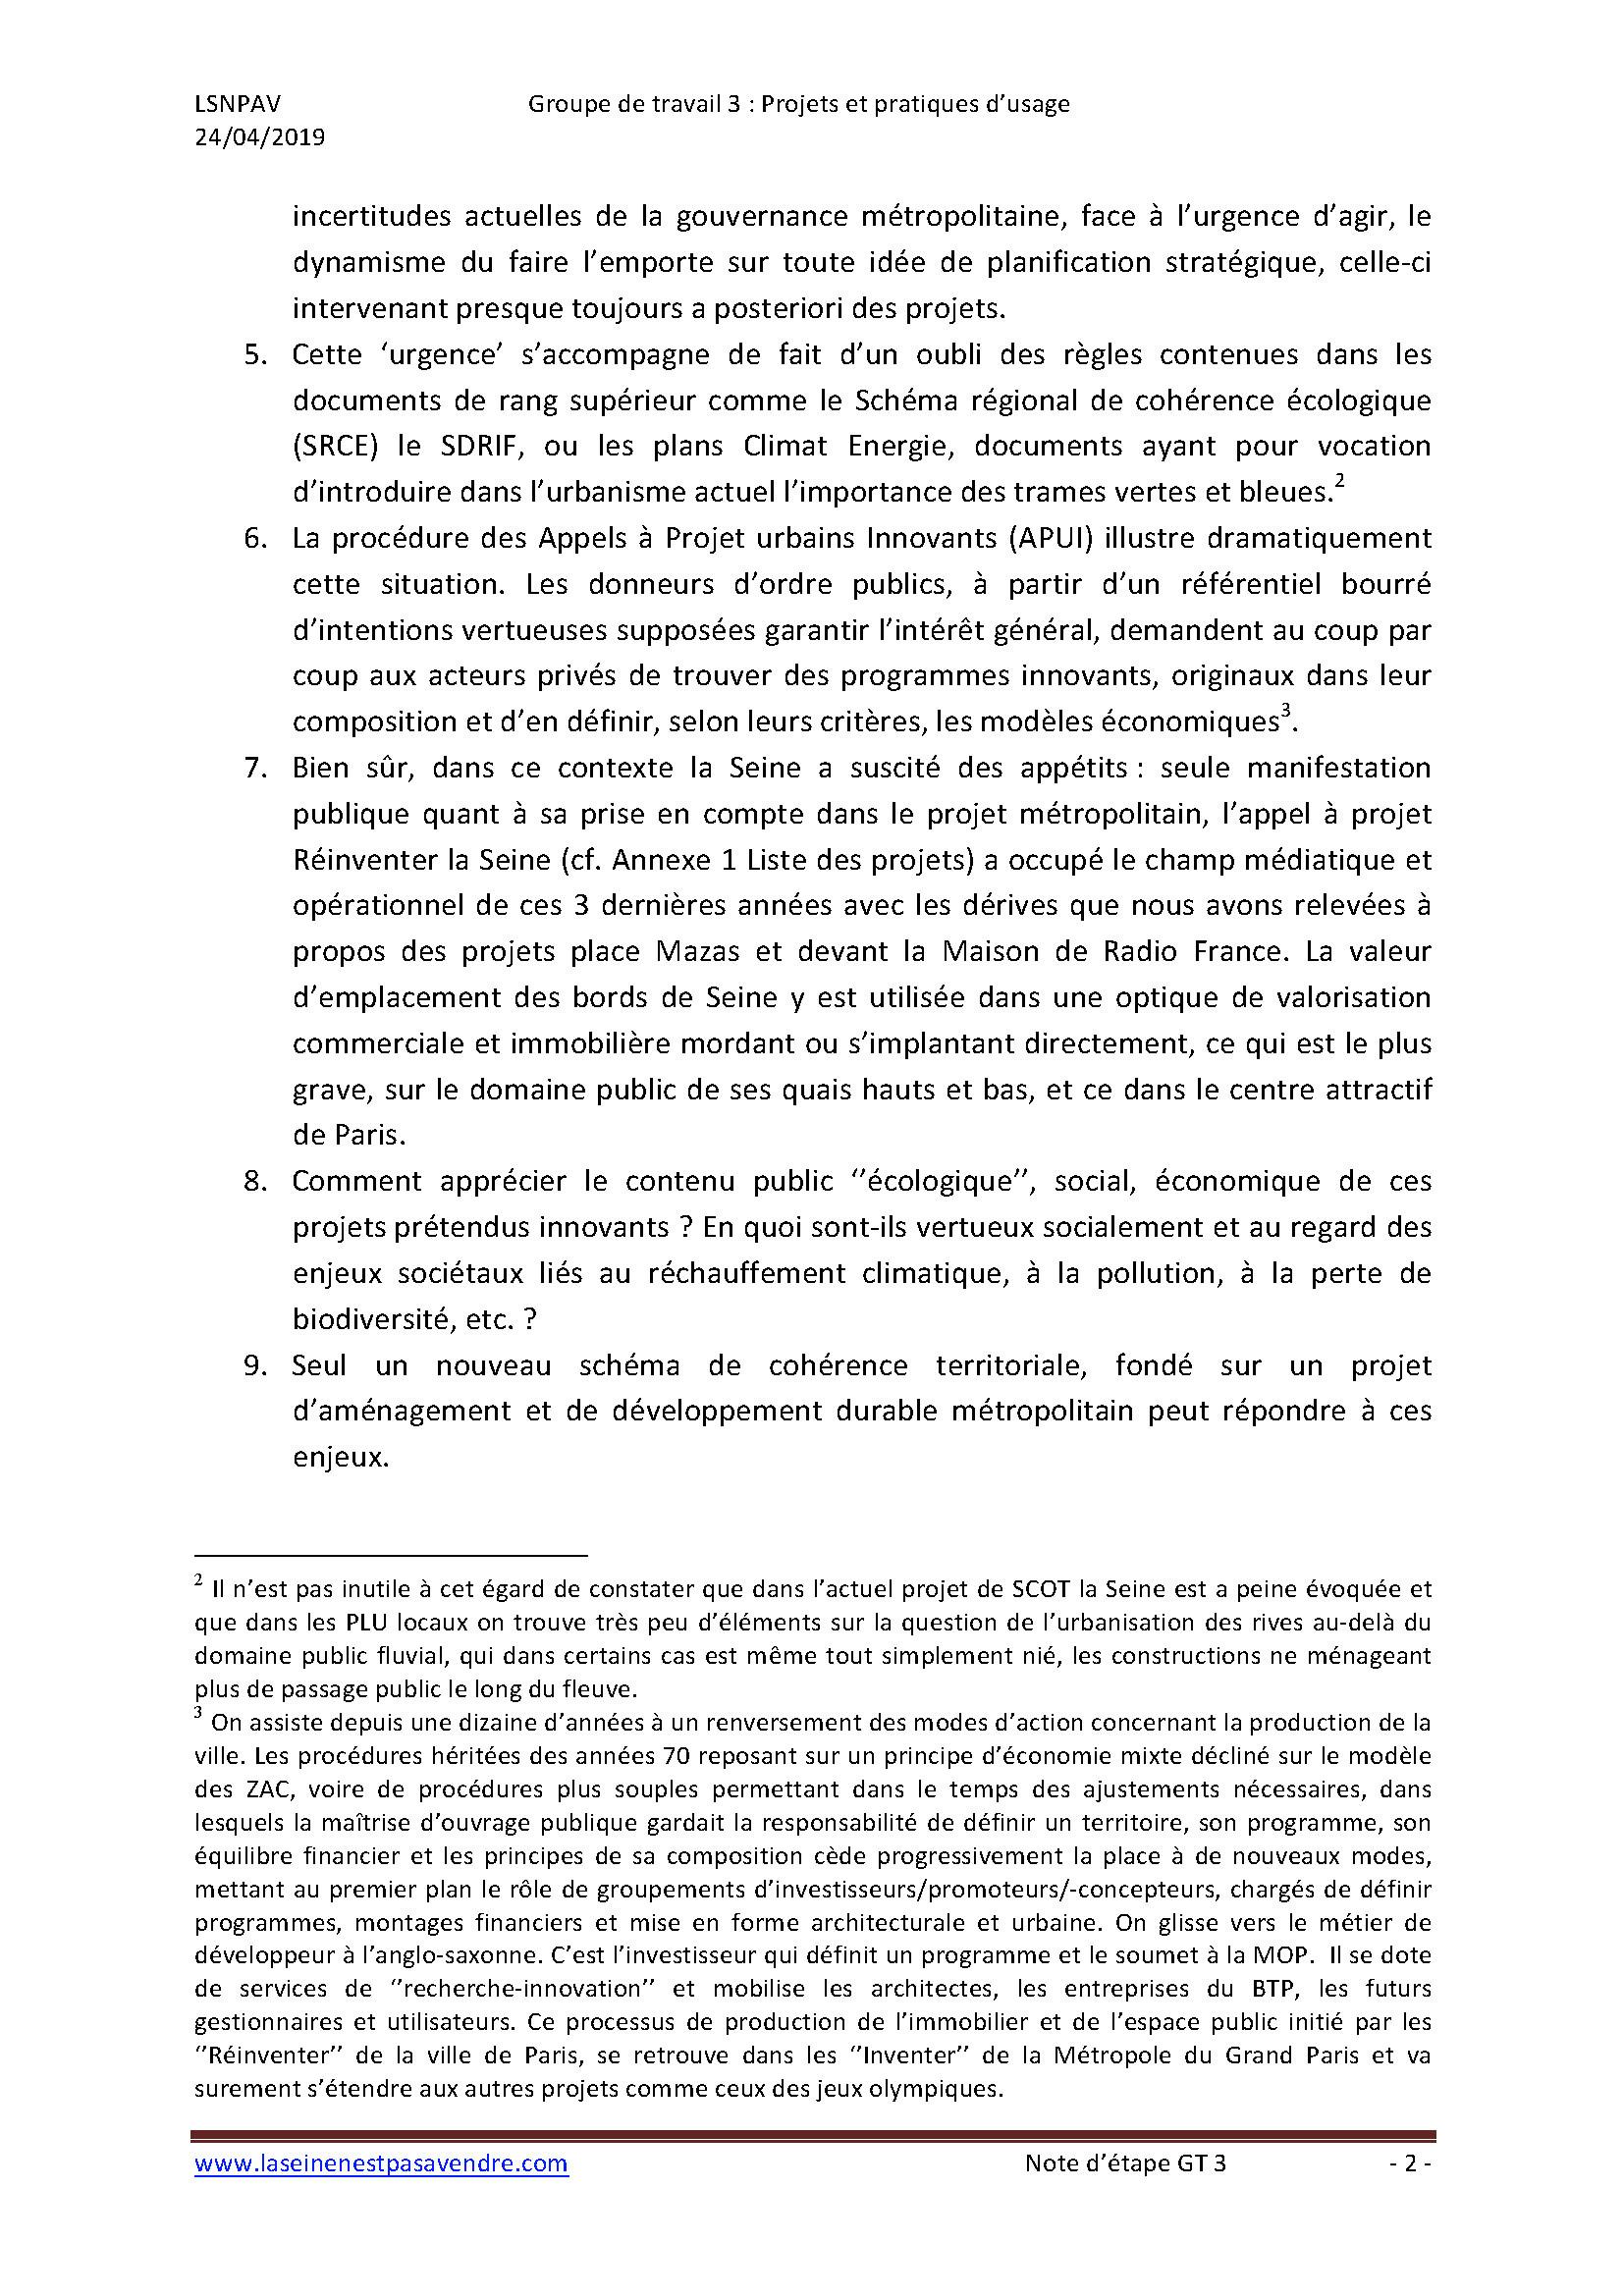 GT 3 Note d'étape_Page_02.jpg